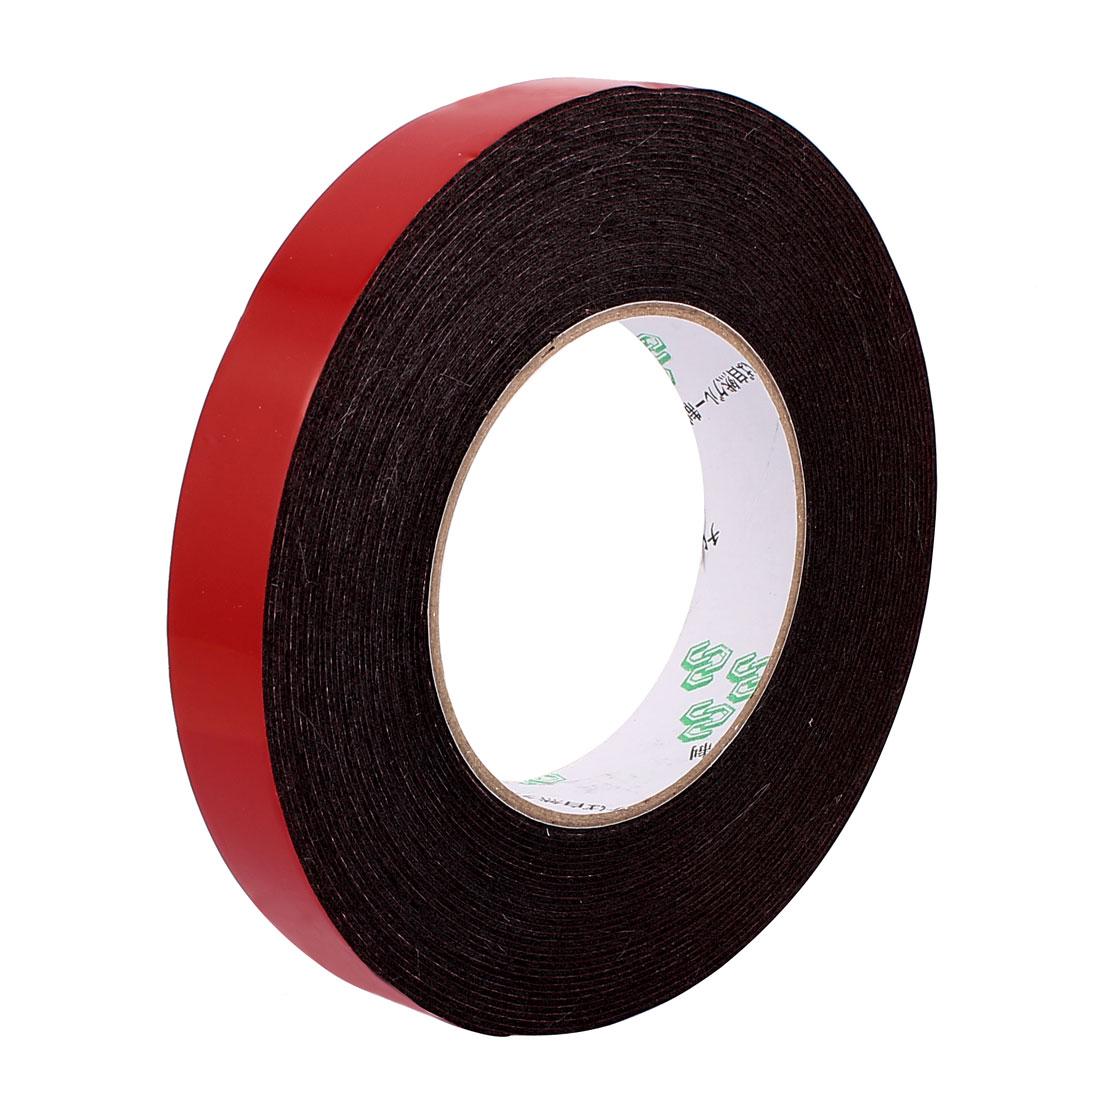 20mmx1mm Double Sided Sponge Tape Adhesive Sticker Foam Glue Strip Sealing 10 Meters 33Ft